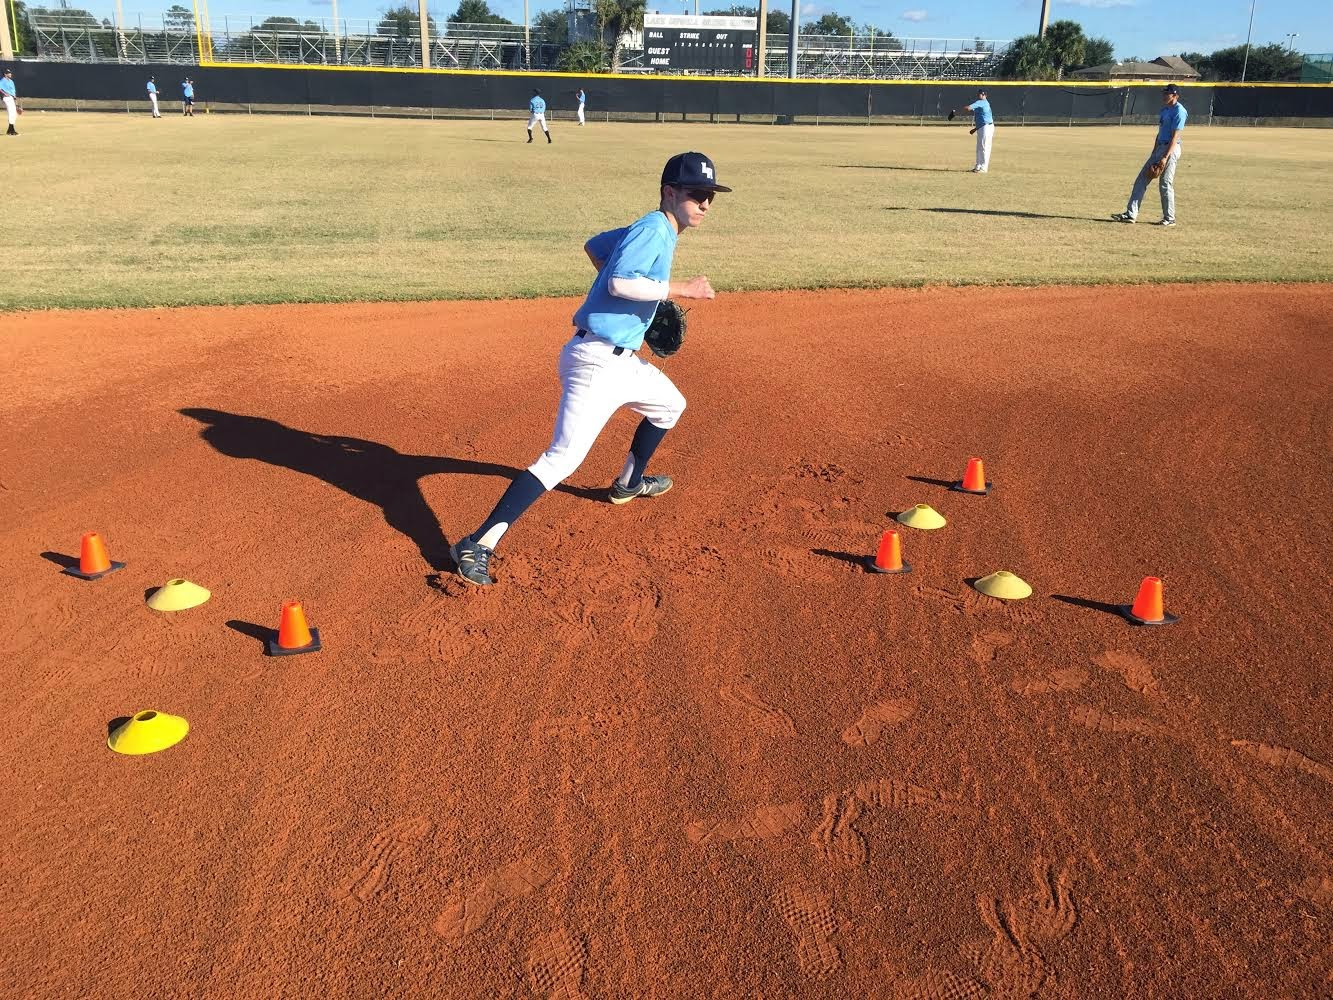 Shortstop Agility Drills   Toffee Art